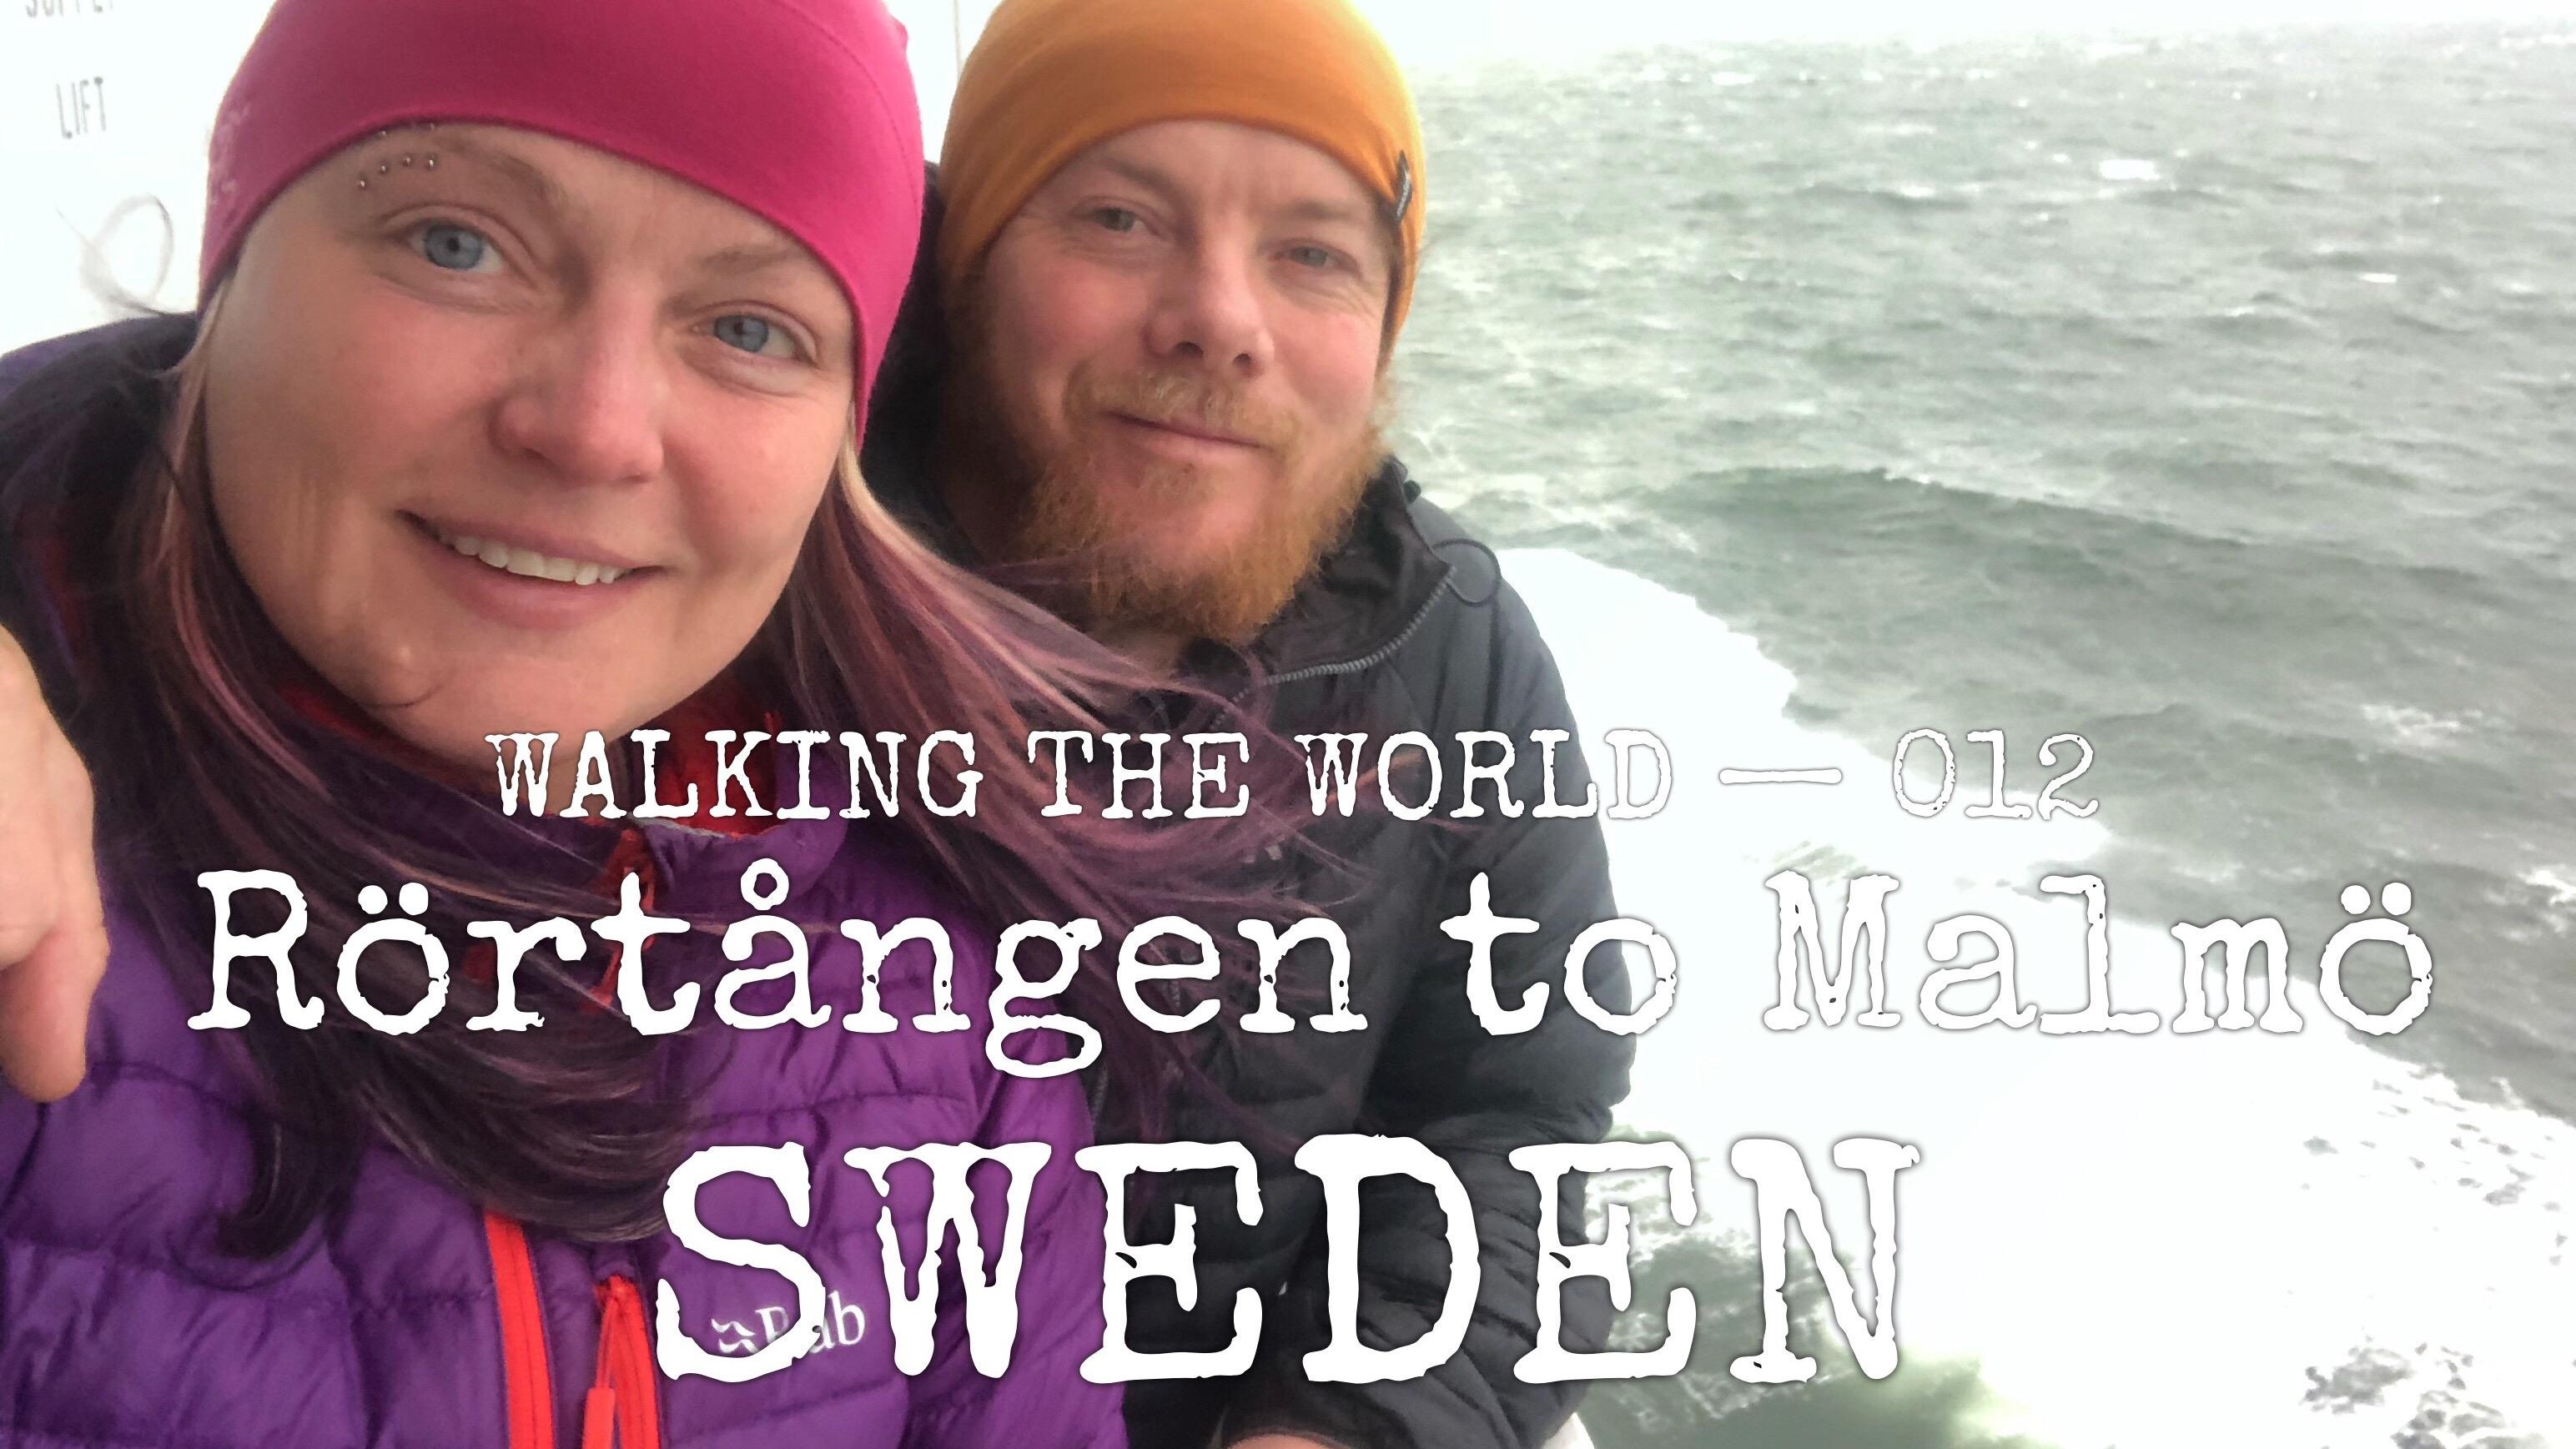 SWEDEN: Rörtången to Malmö